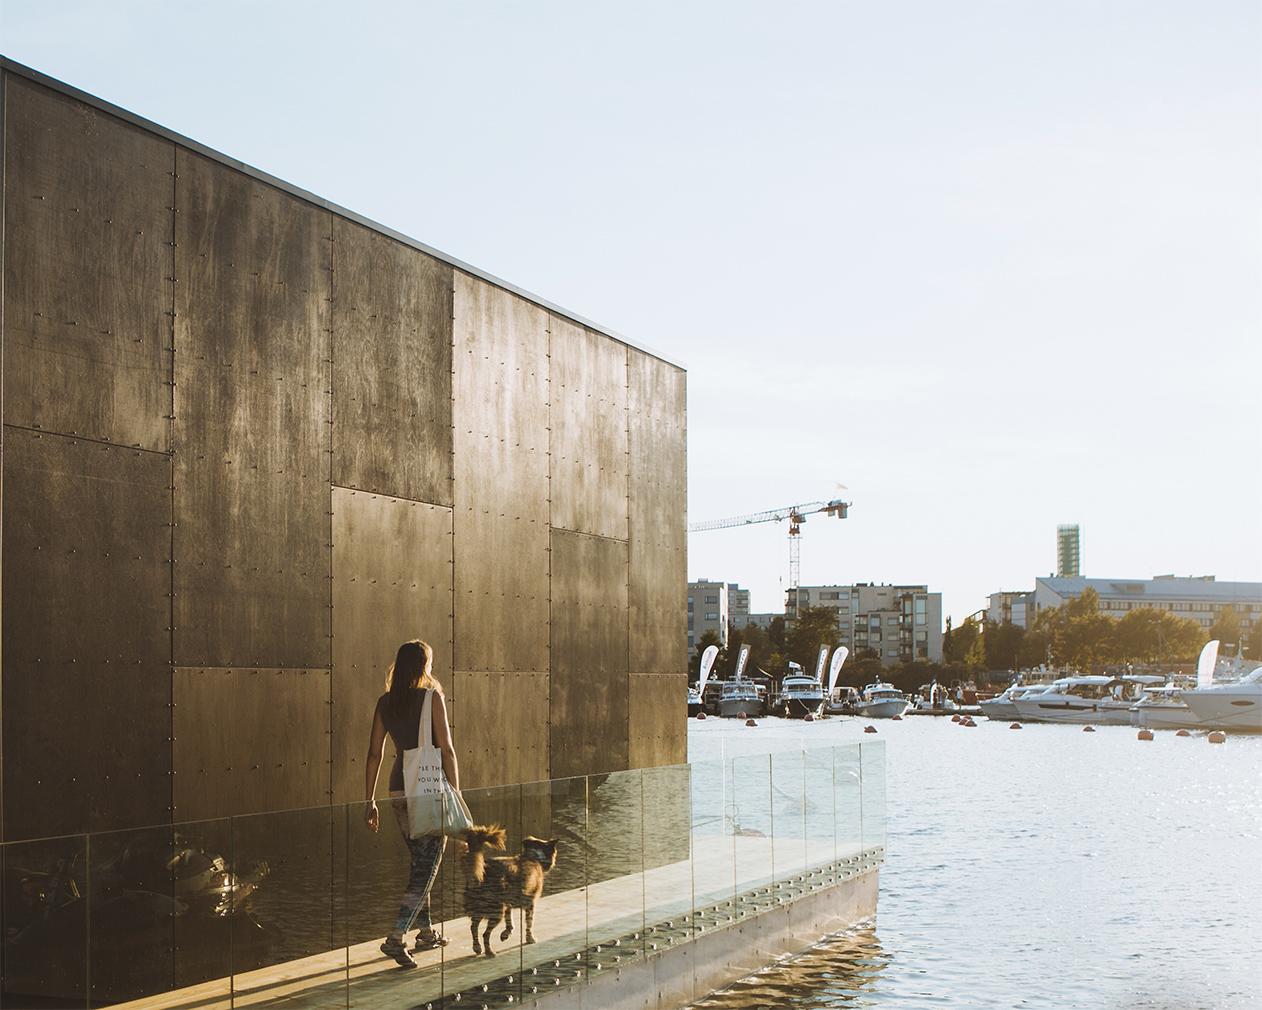 Kodasema's latest prefab rethinks the life aquatic with floating tiny home